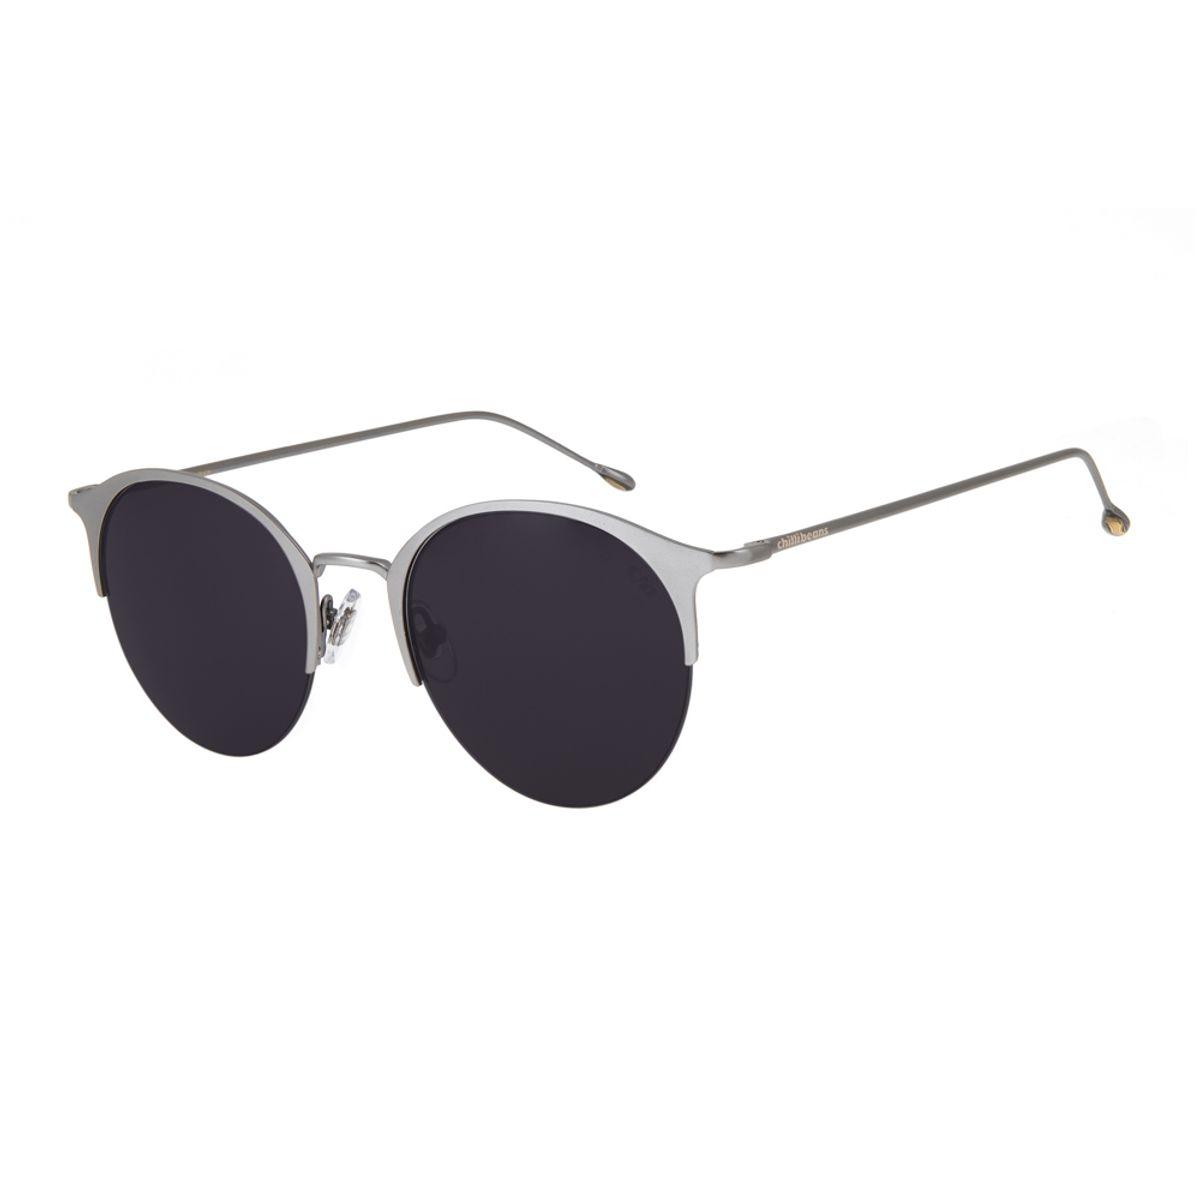 4d9b802301d19 Óculos de Sol Chilli Beans Feminino Jazz Redondo Arte de Rua Cranio ...